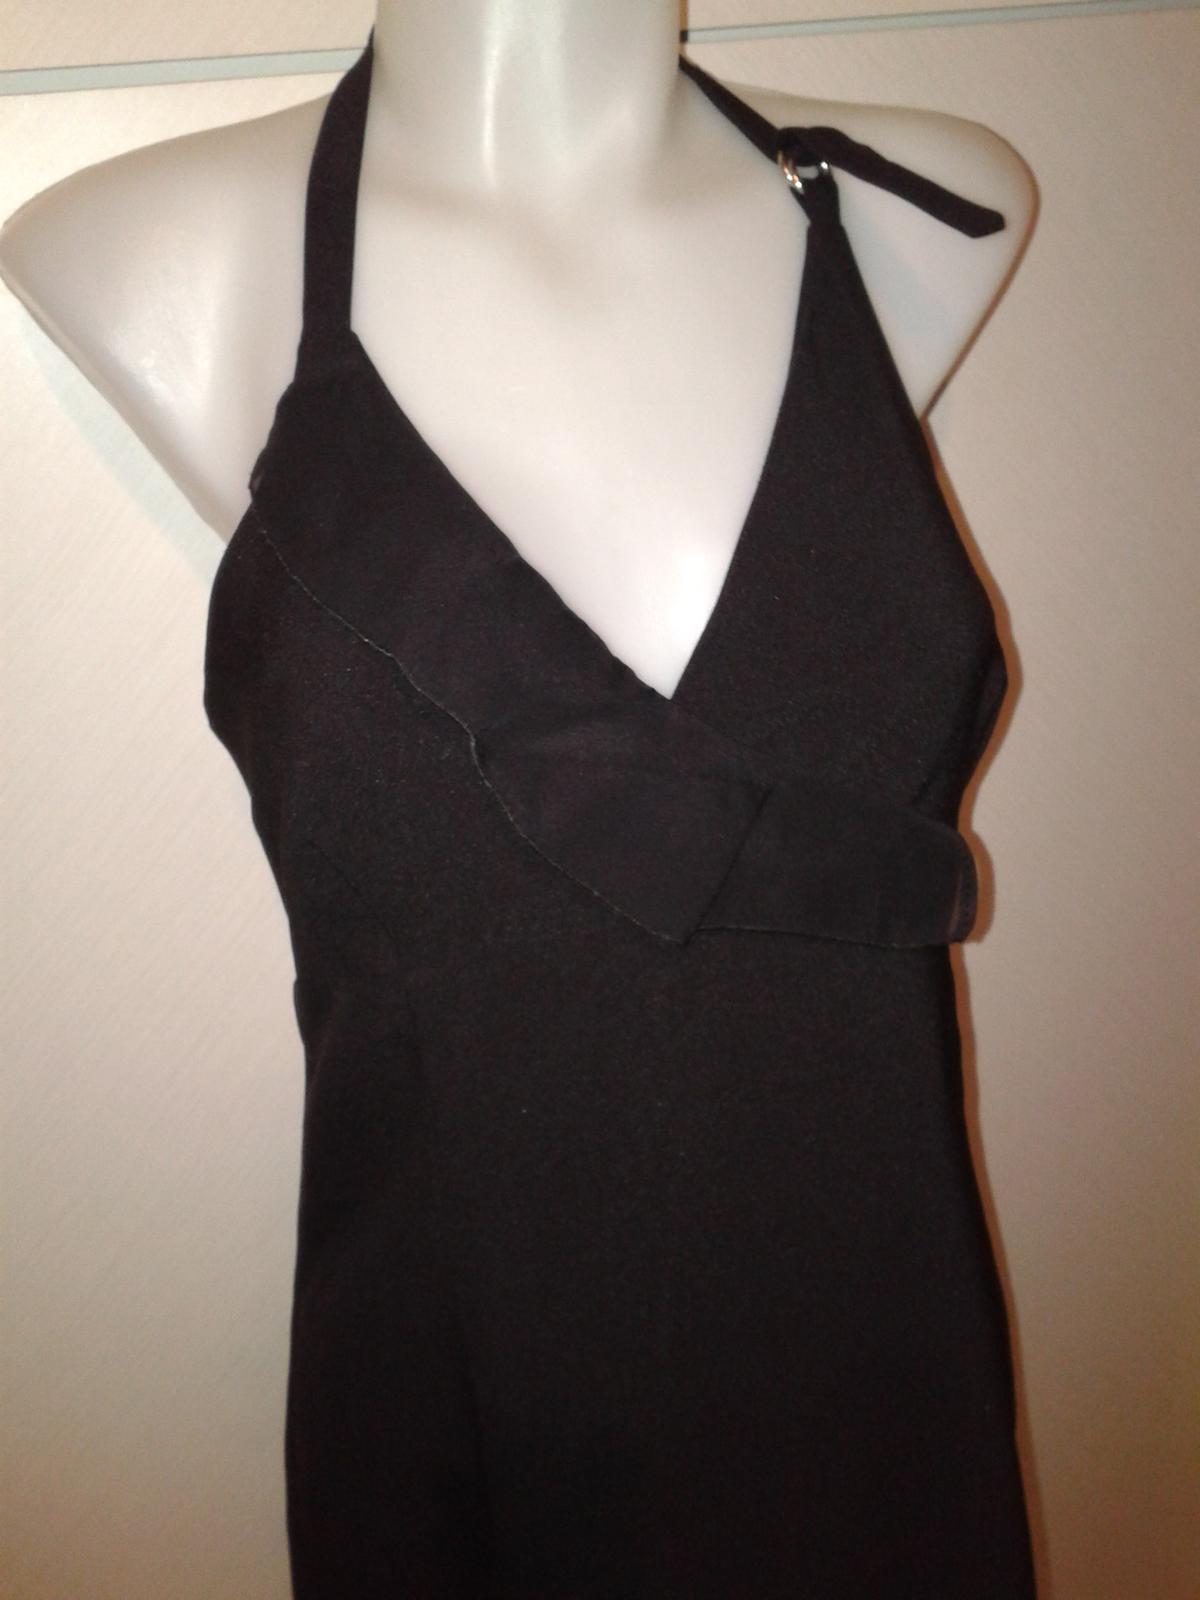 čierne spoločenské šaty s volánom Tally Weijl36/38 - Obrázok č. 2